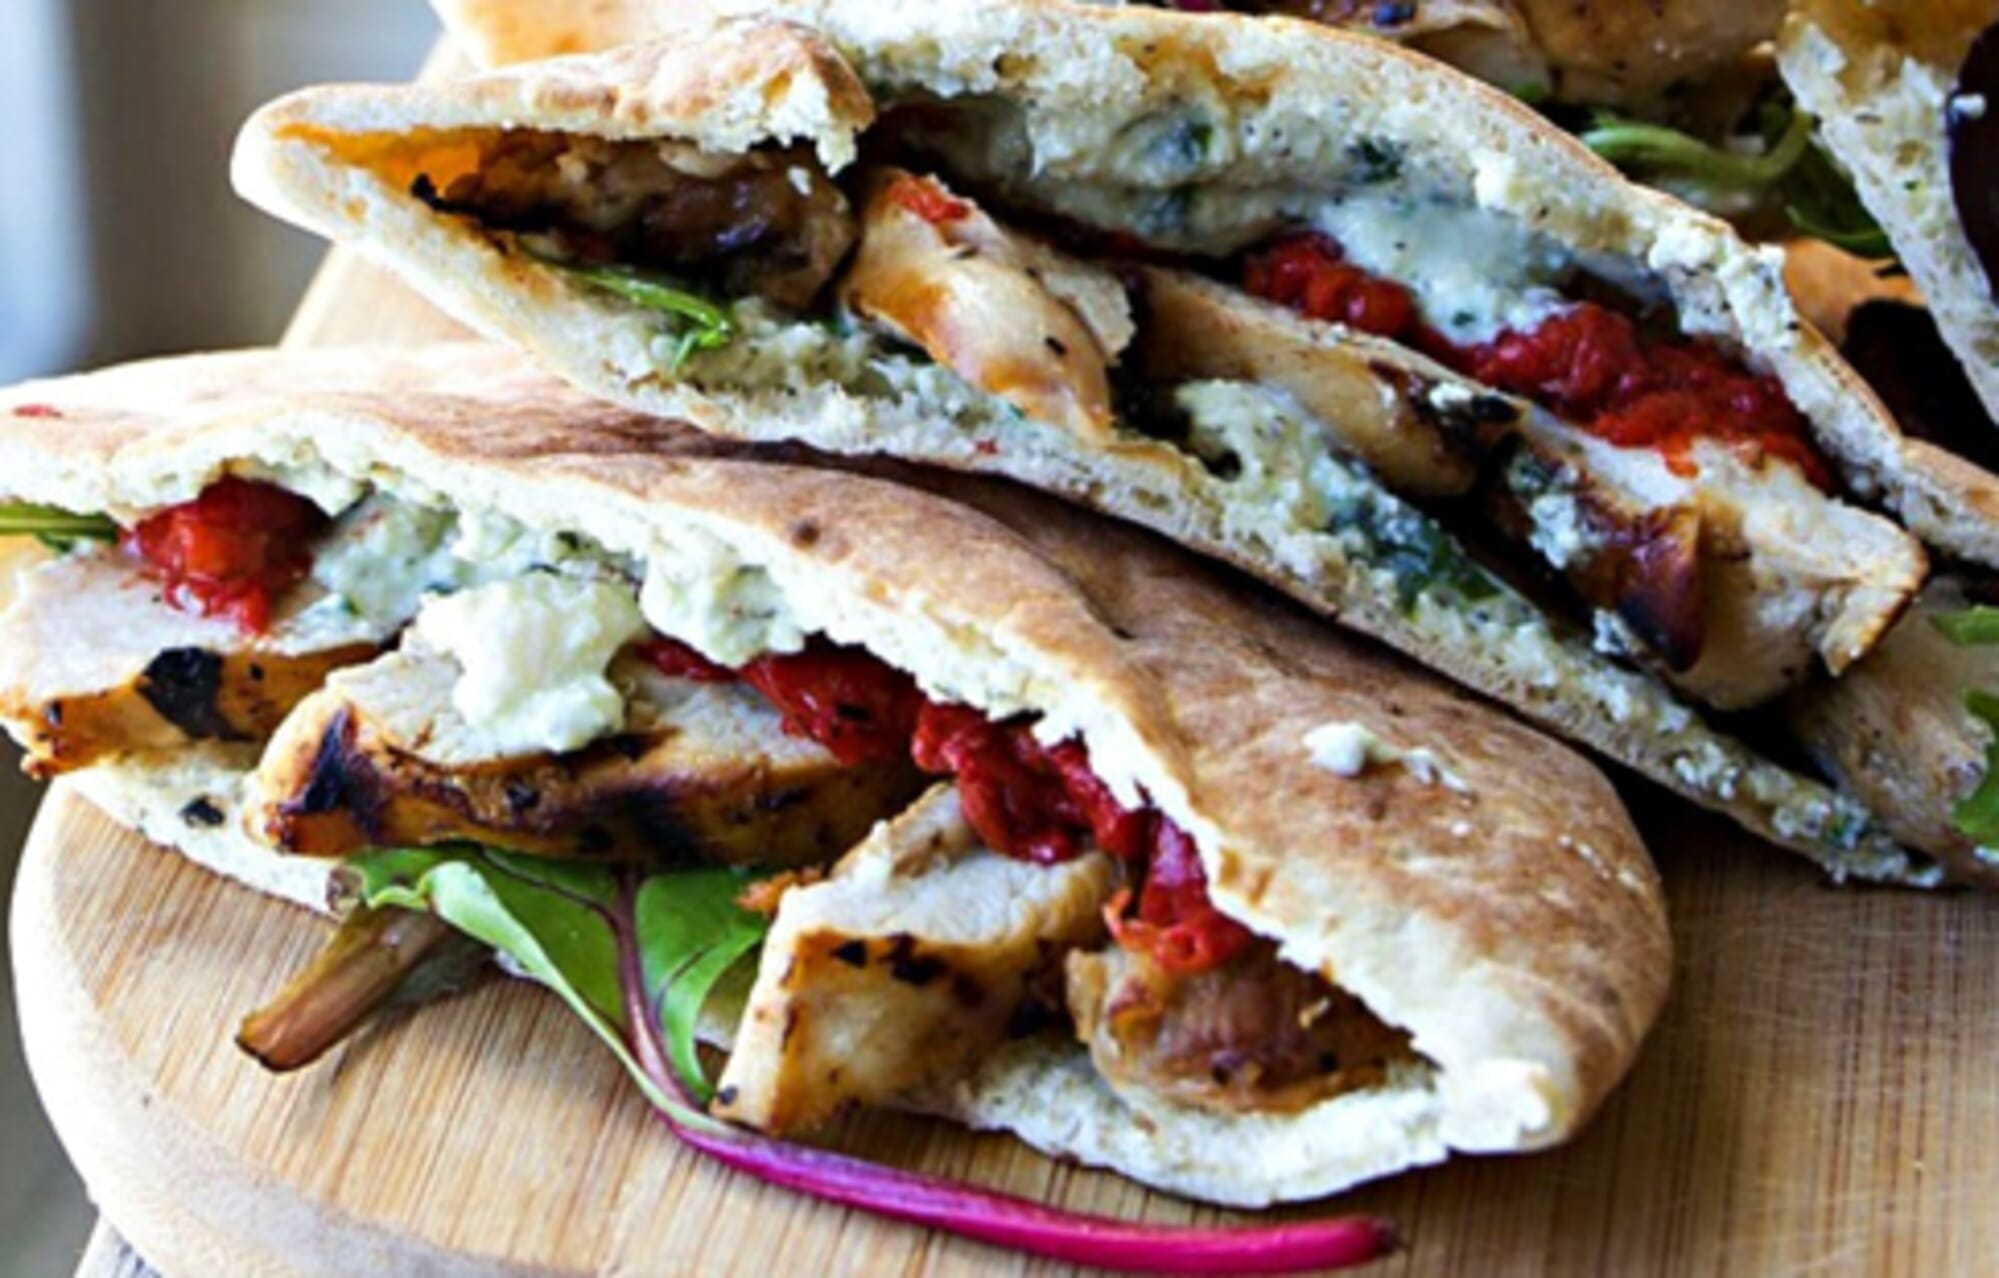 SPONSORED: Grilled Italian Chicken Pita w/ the MOST AMAZING Vegan Ricotta (DF, Nut-Free)